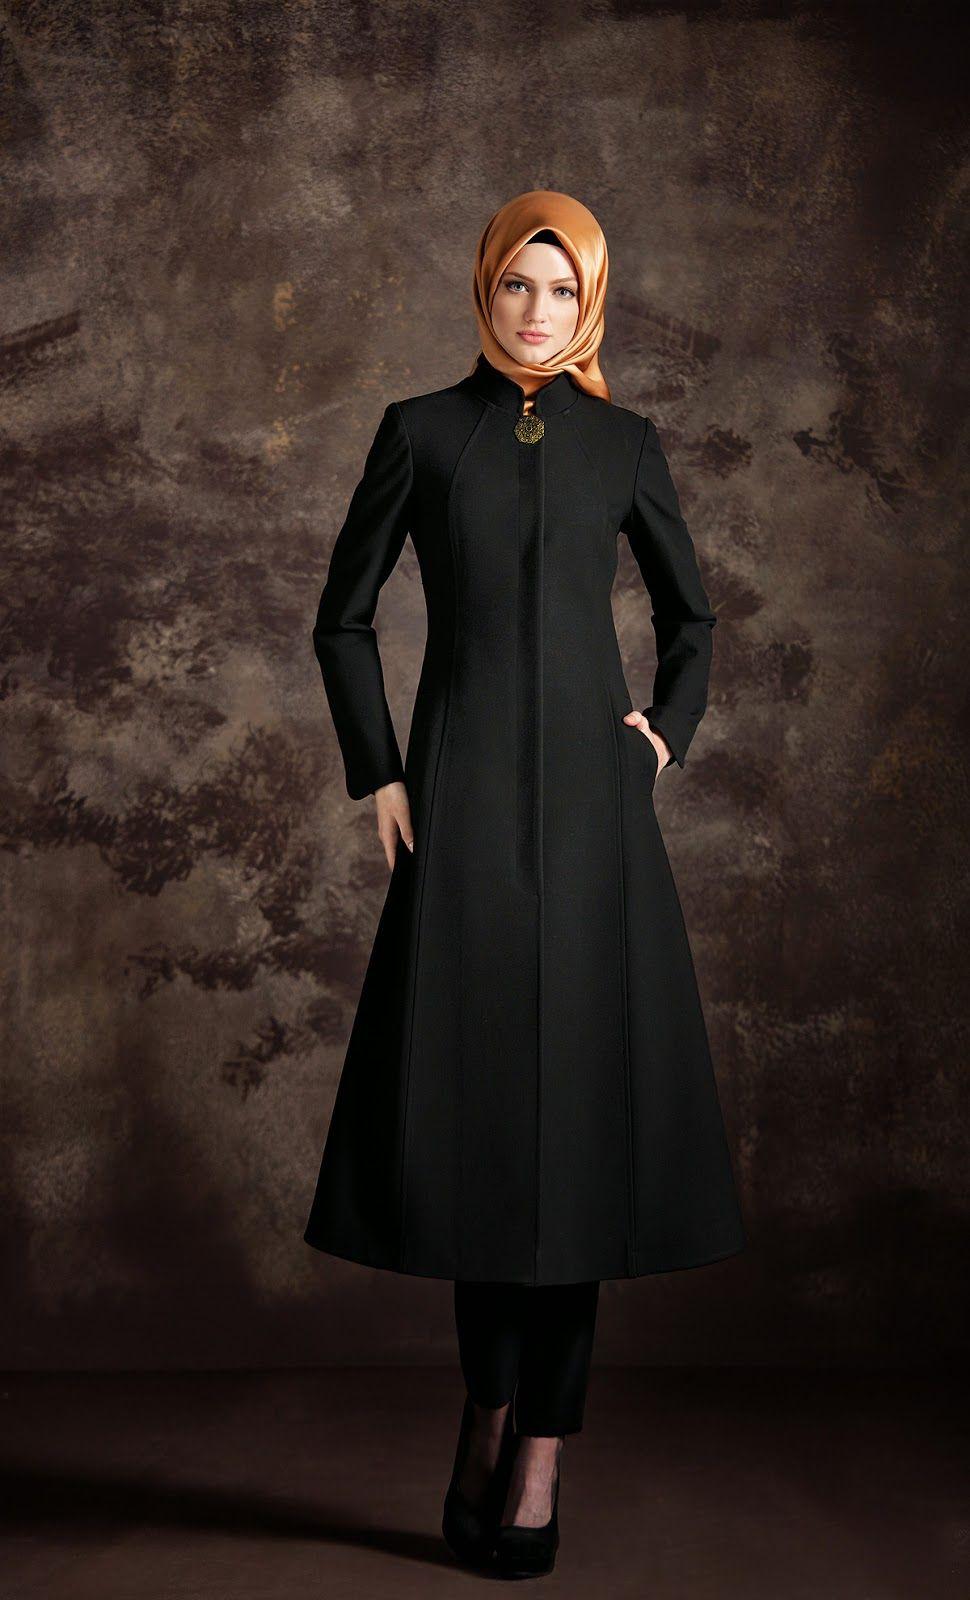 tenue et v tements hijab hiver 2015 modeles femme mohajaba pinterest hijabs abayas and robe. Black Bedroom Furniture Sets. Home Design Ideas